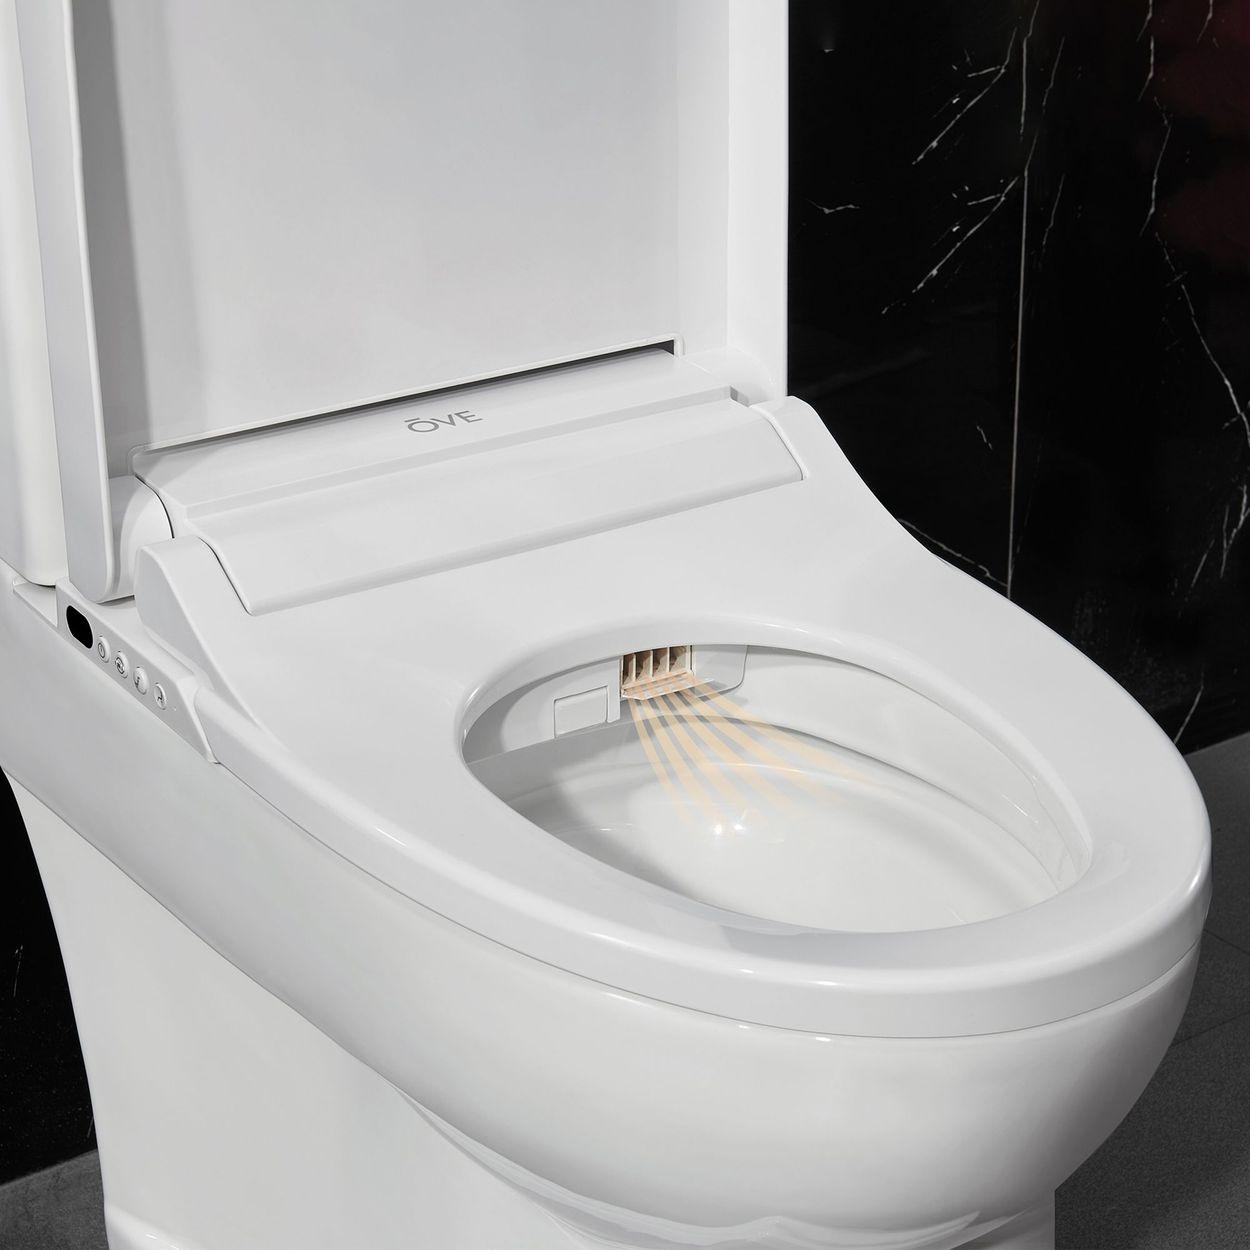 Astounding Details About Irenne Classic Smart Bidet Toilet By Ove Led Night Light W Auto Open Close Lid Machost Co Dining Chair Design Ideas Machostcouk